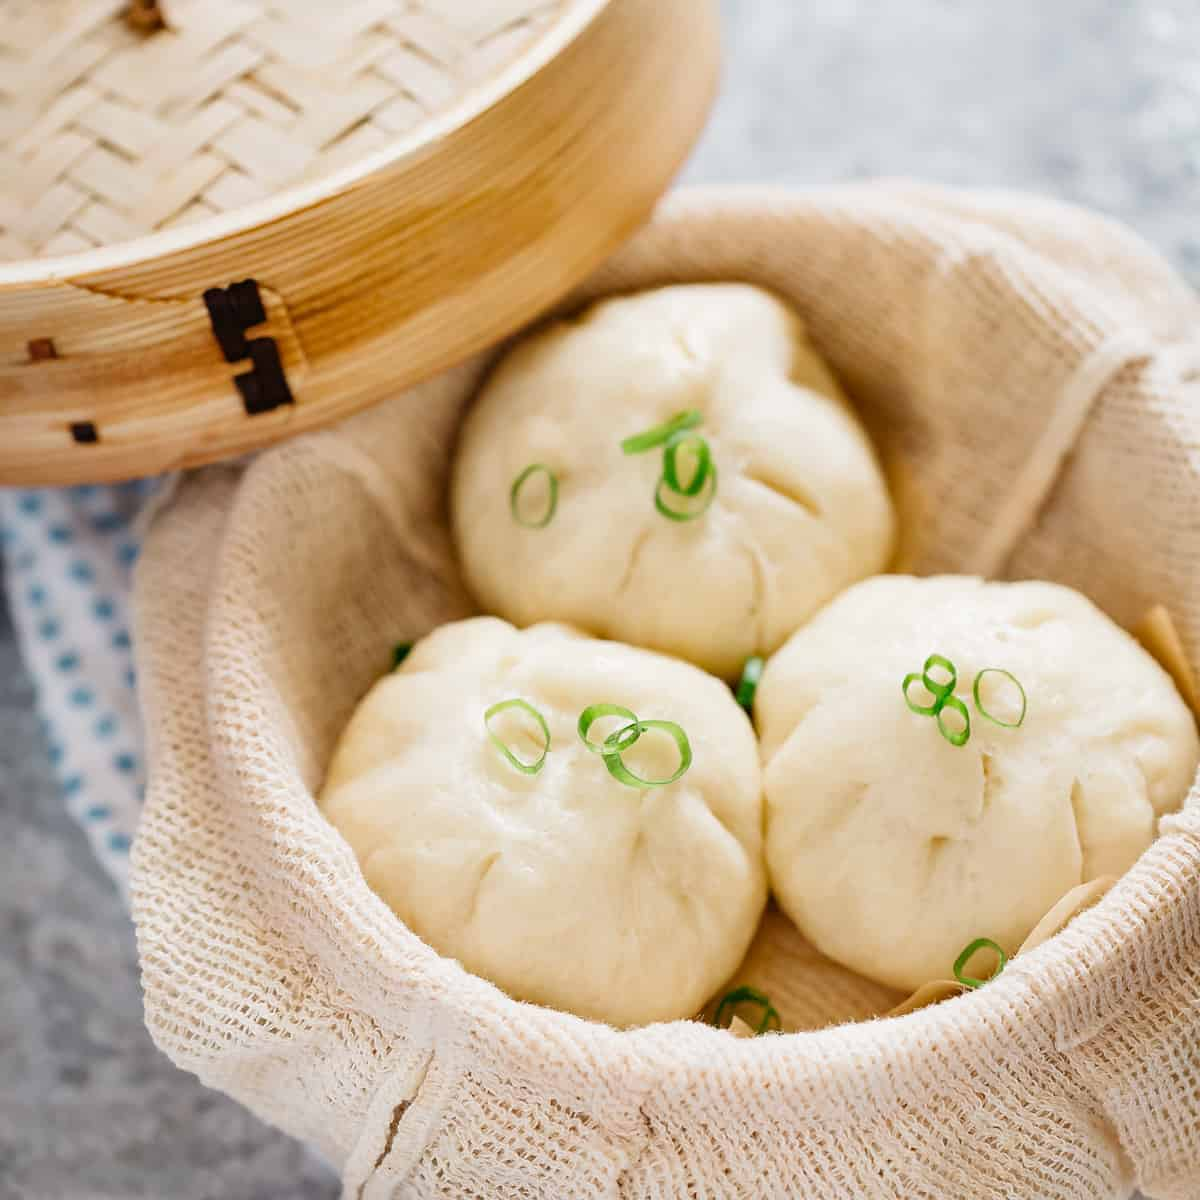 Freshly steamed three pork buns in a bamboo steamer